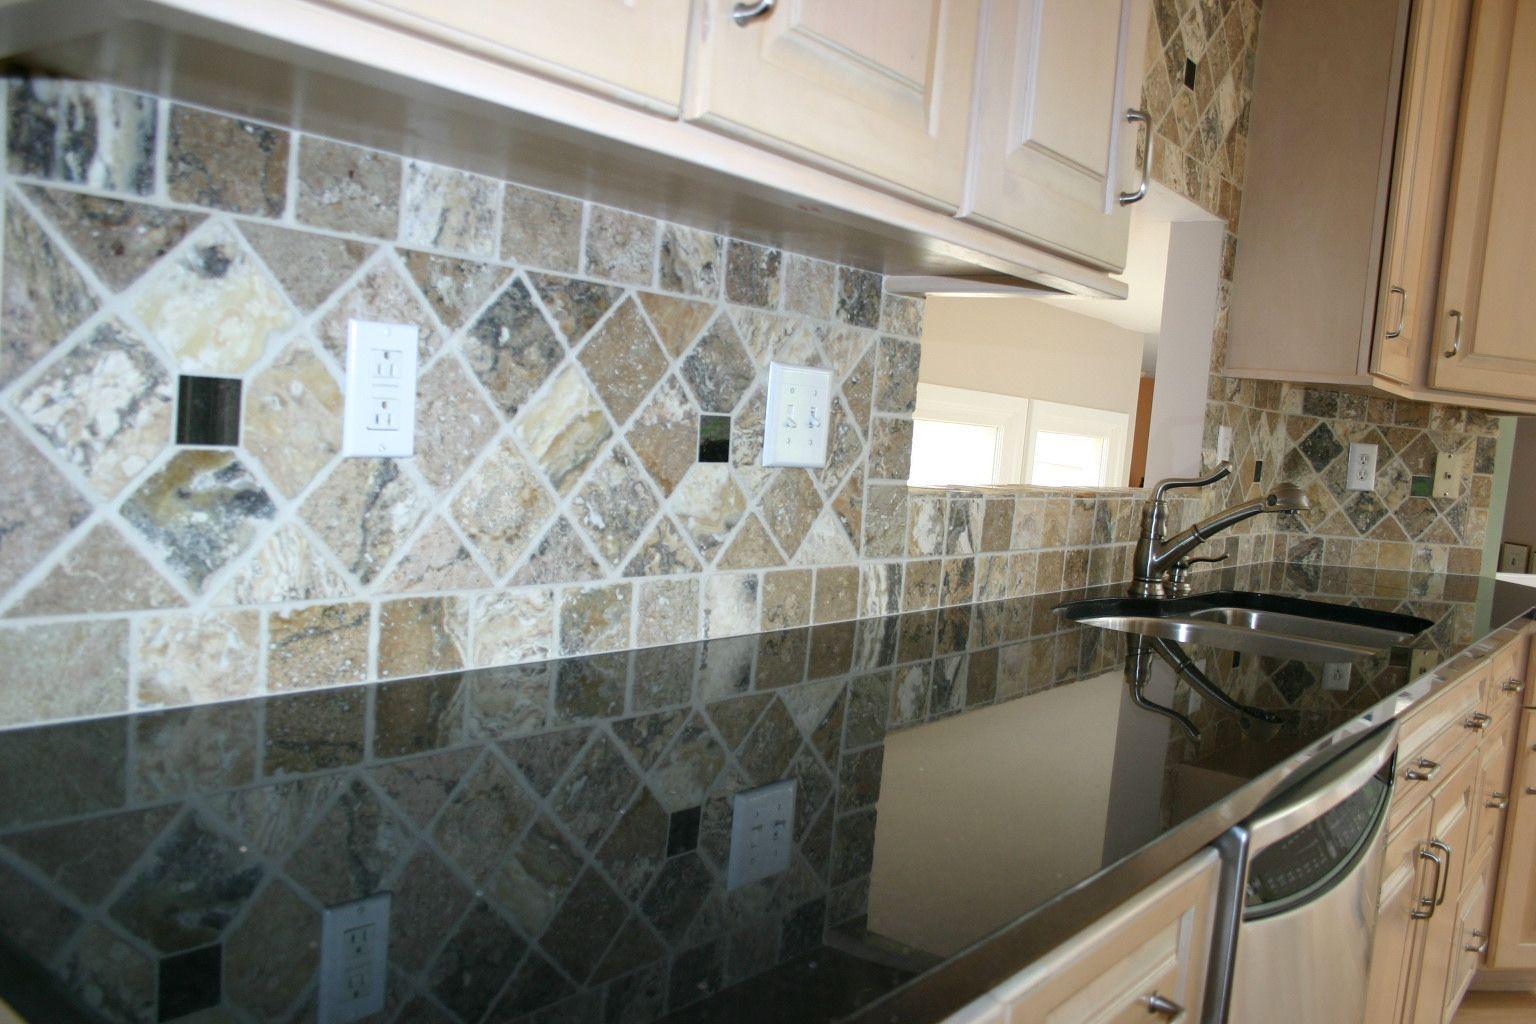 Kitchen Backsplash Ideas With Black Granite Countertops   Bing Images Design Inspirations